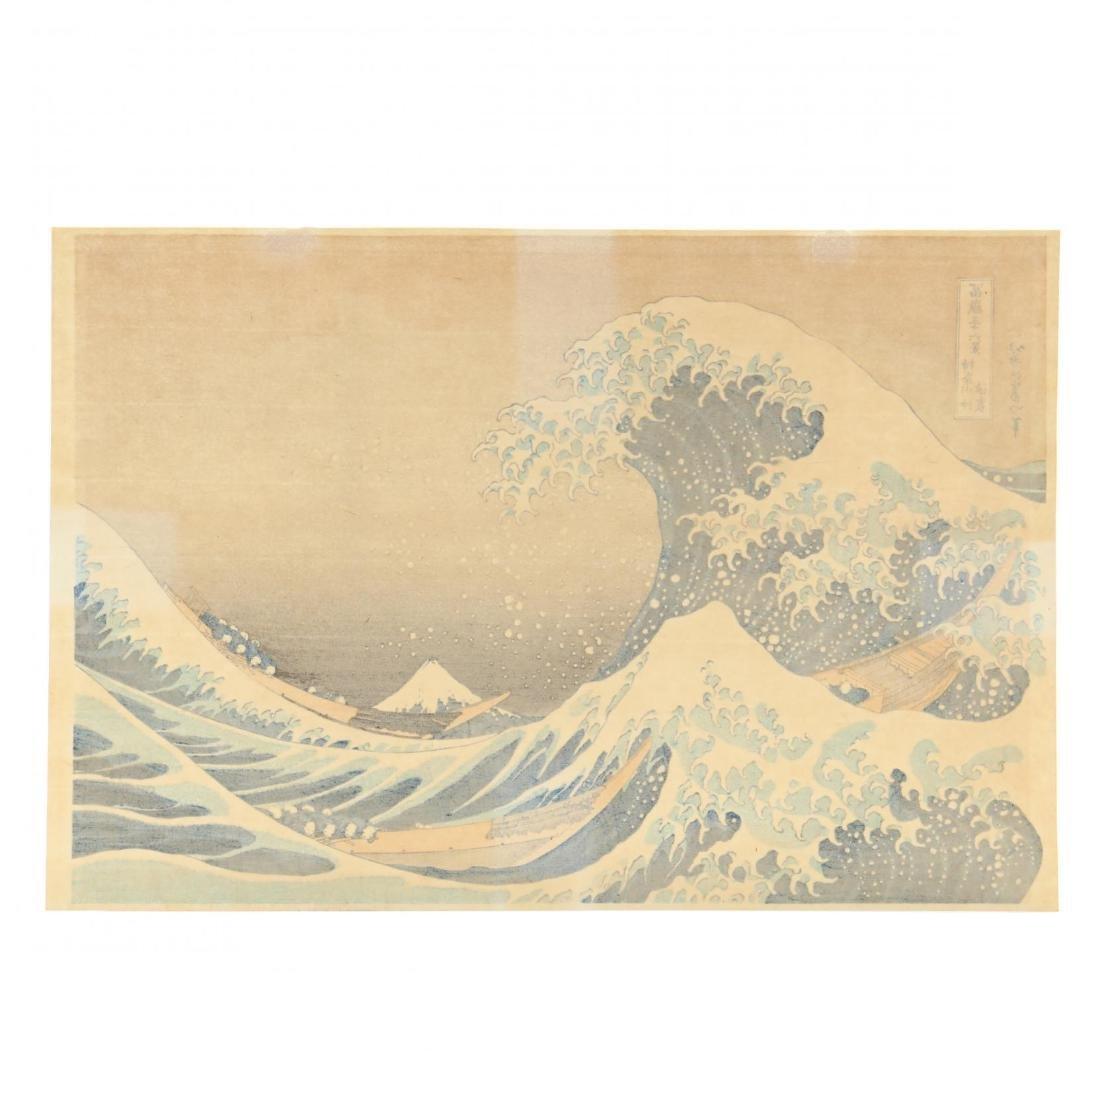 Kanagawa  by Katsushika Hokusai (Japanese, 1760-1849) - 4